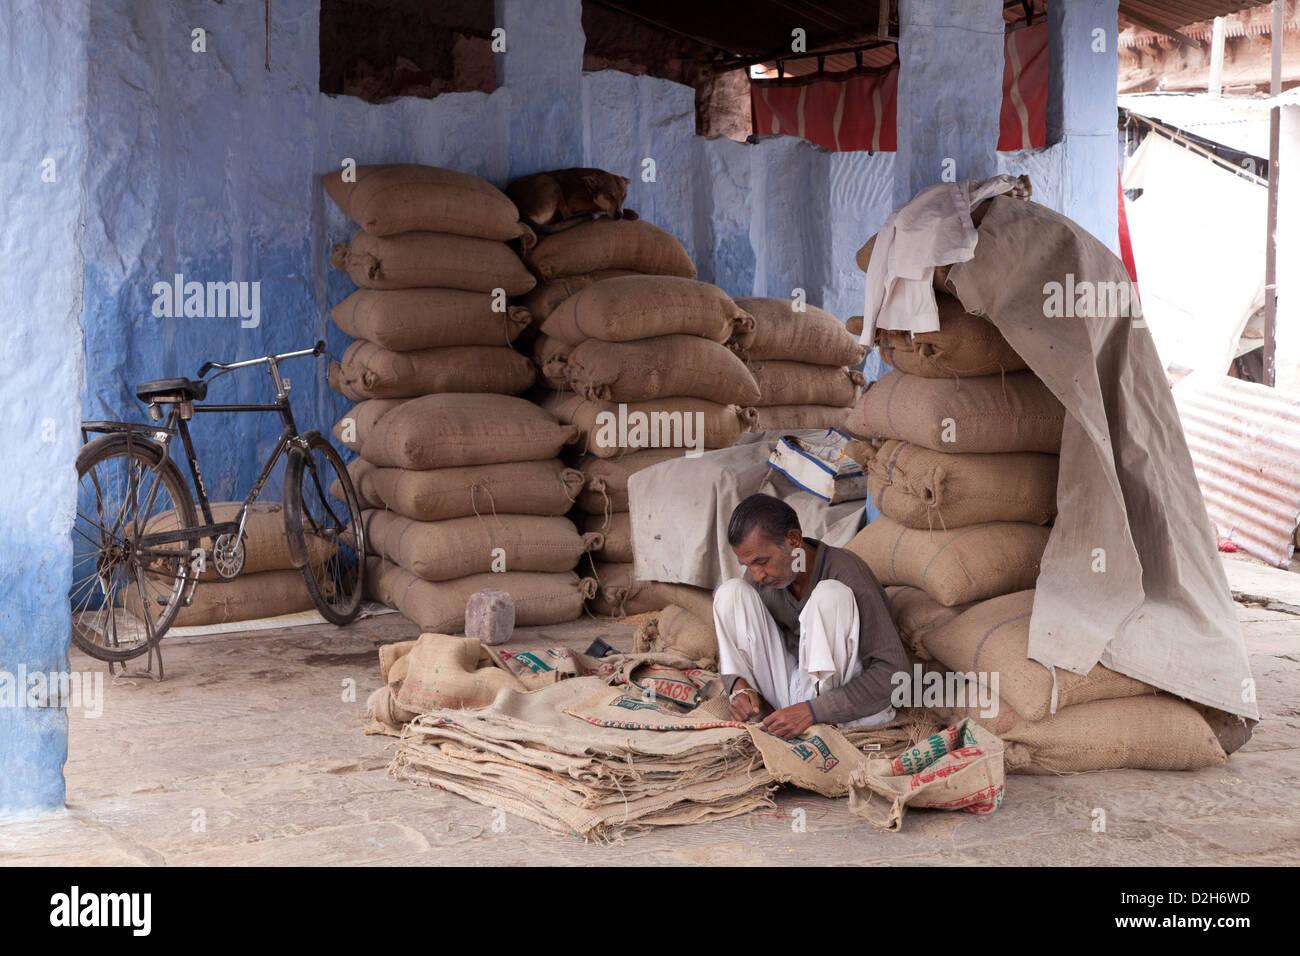 India, Rajasthan, Jodhpur man repairing hessian sacking used for carrying grain - Stock Image